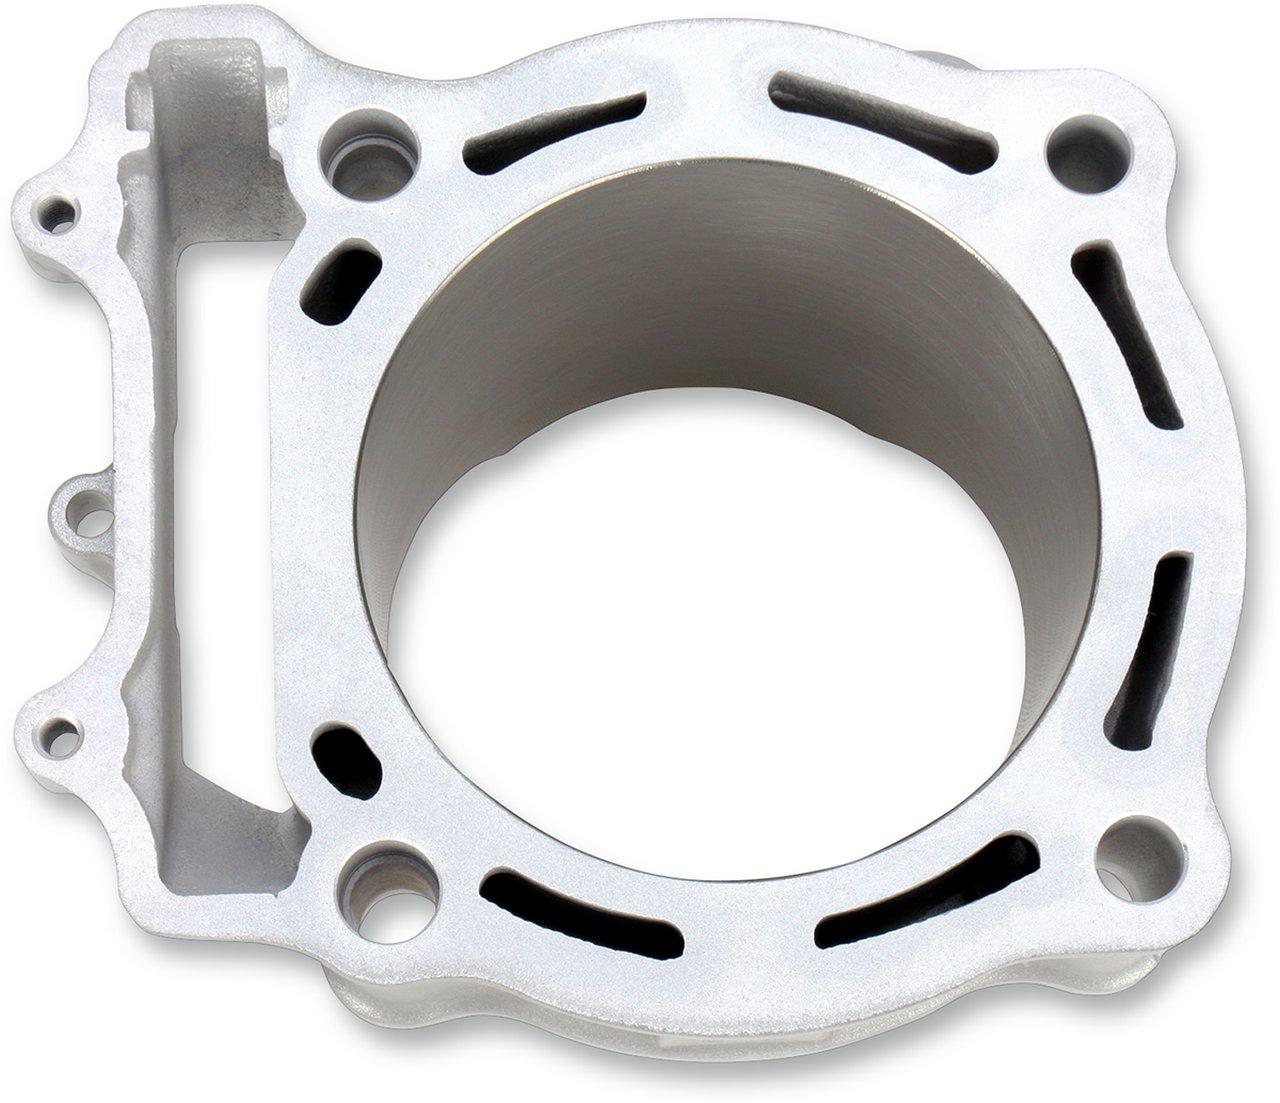 【MOOSE RACING】維修用汽缸 [0931-0461] - 「Webike-摩托百貨」